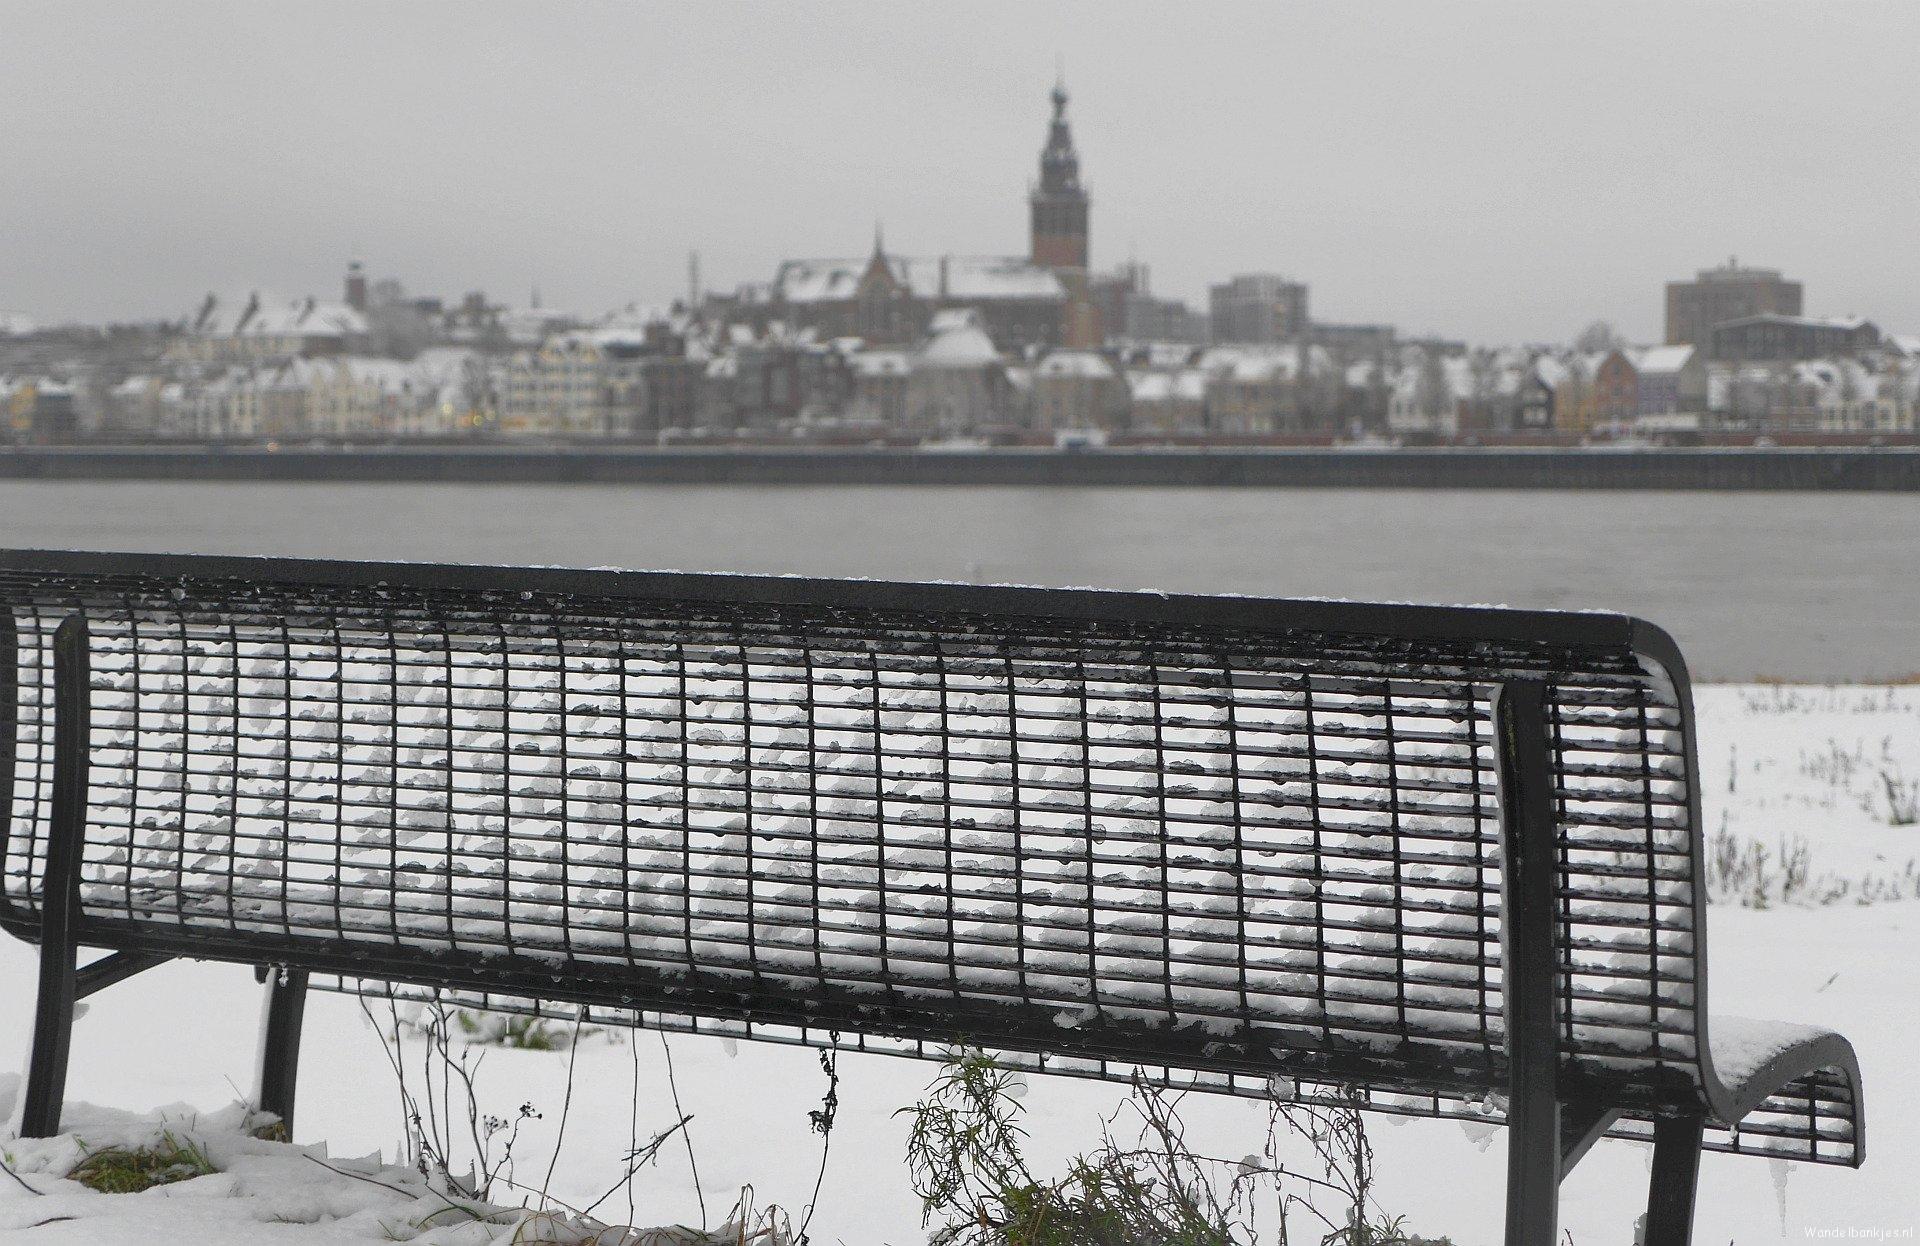 rt-arthurskm-even-more-walk-on-the-background-the-skyline-of-nijmegen-https-t-co-pw9ykfikms